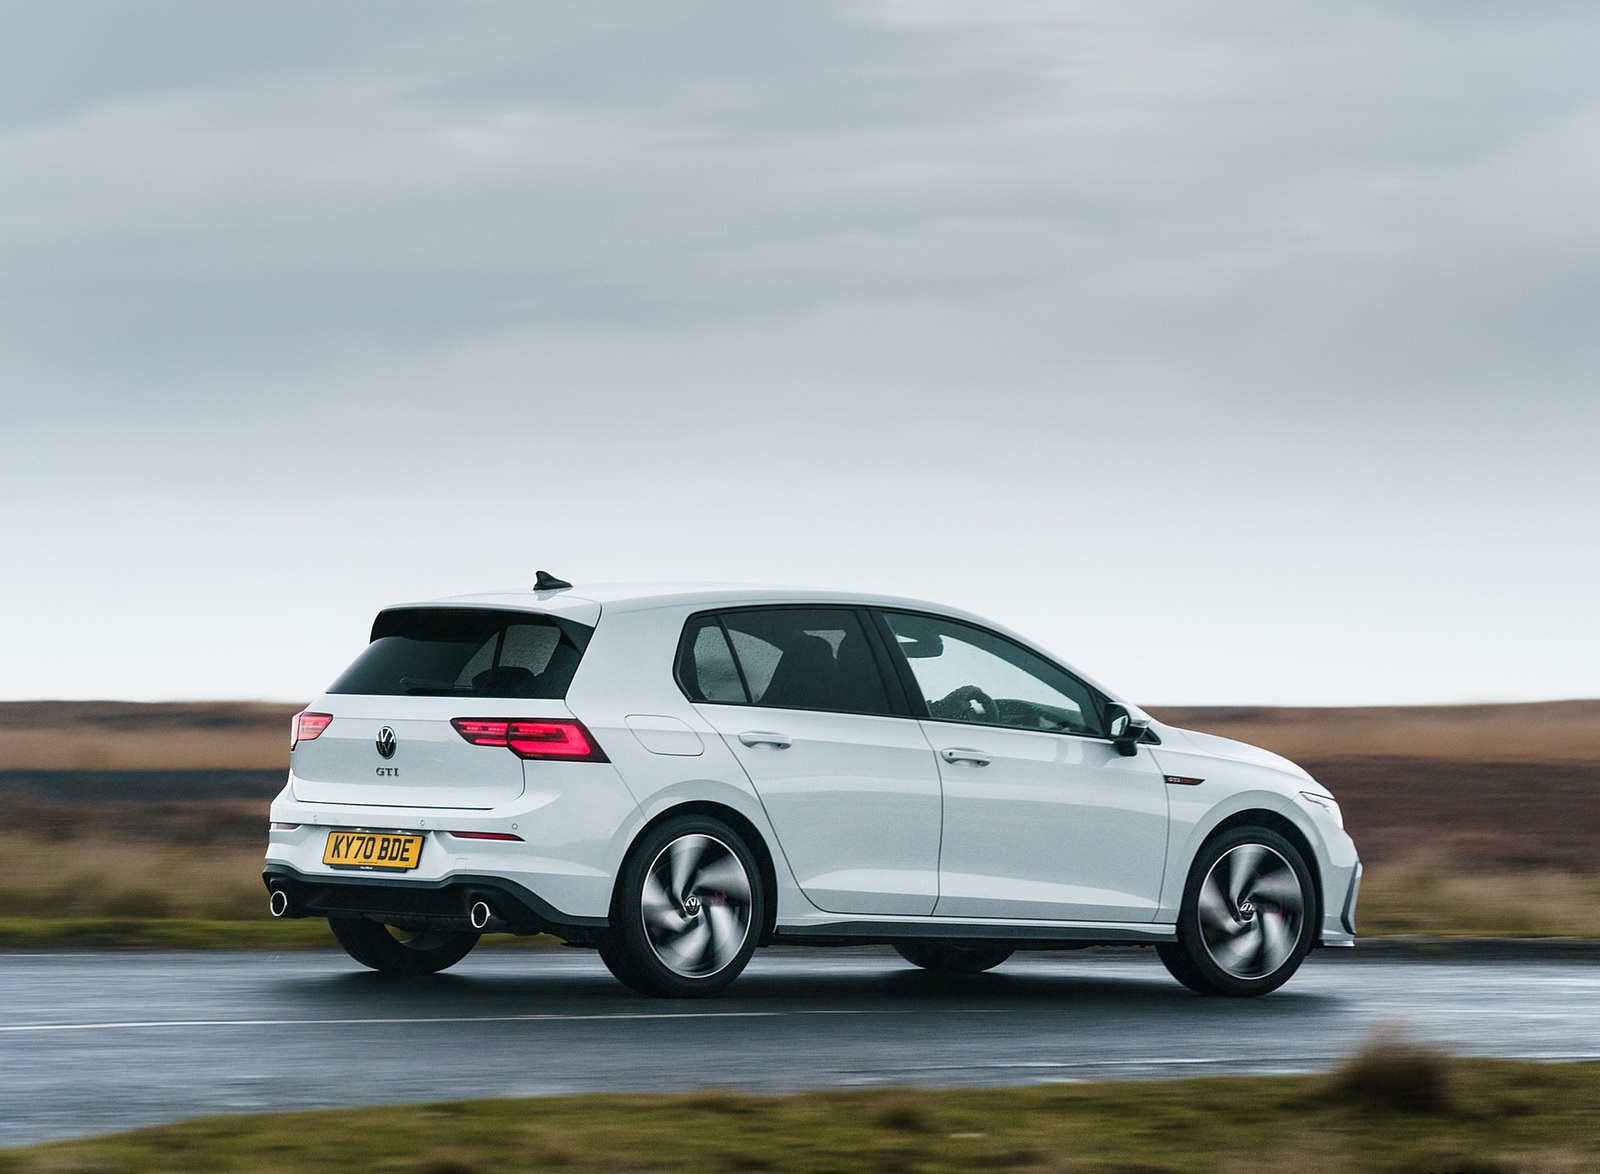 2021 Volkswagen Golf GTI (UK-Spec) Rear Three-Quarter Wallpapers  (10)